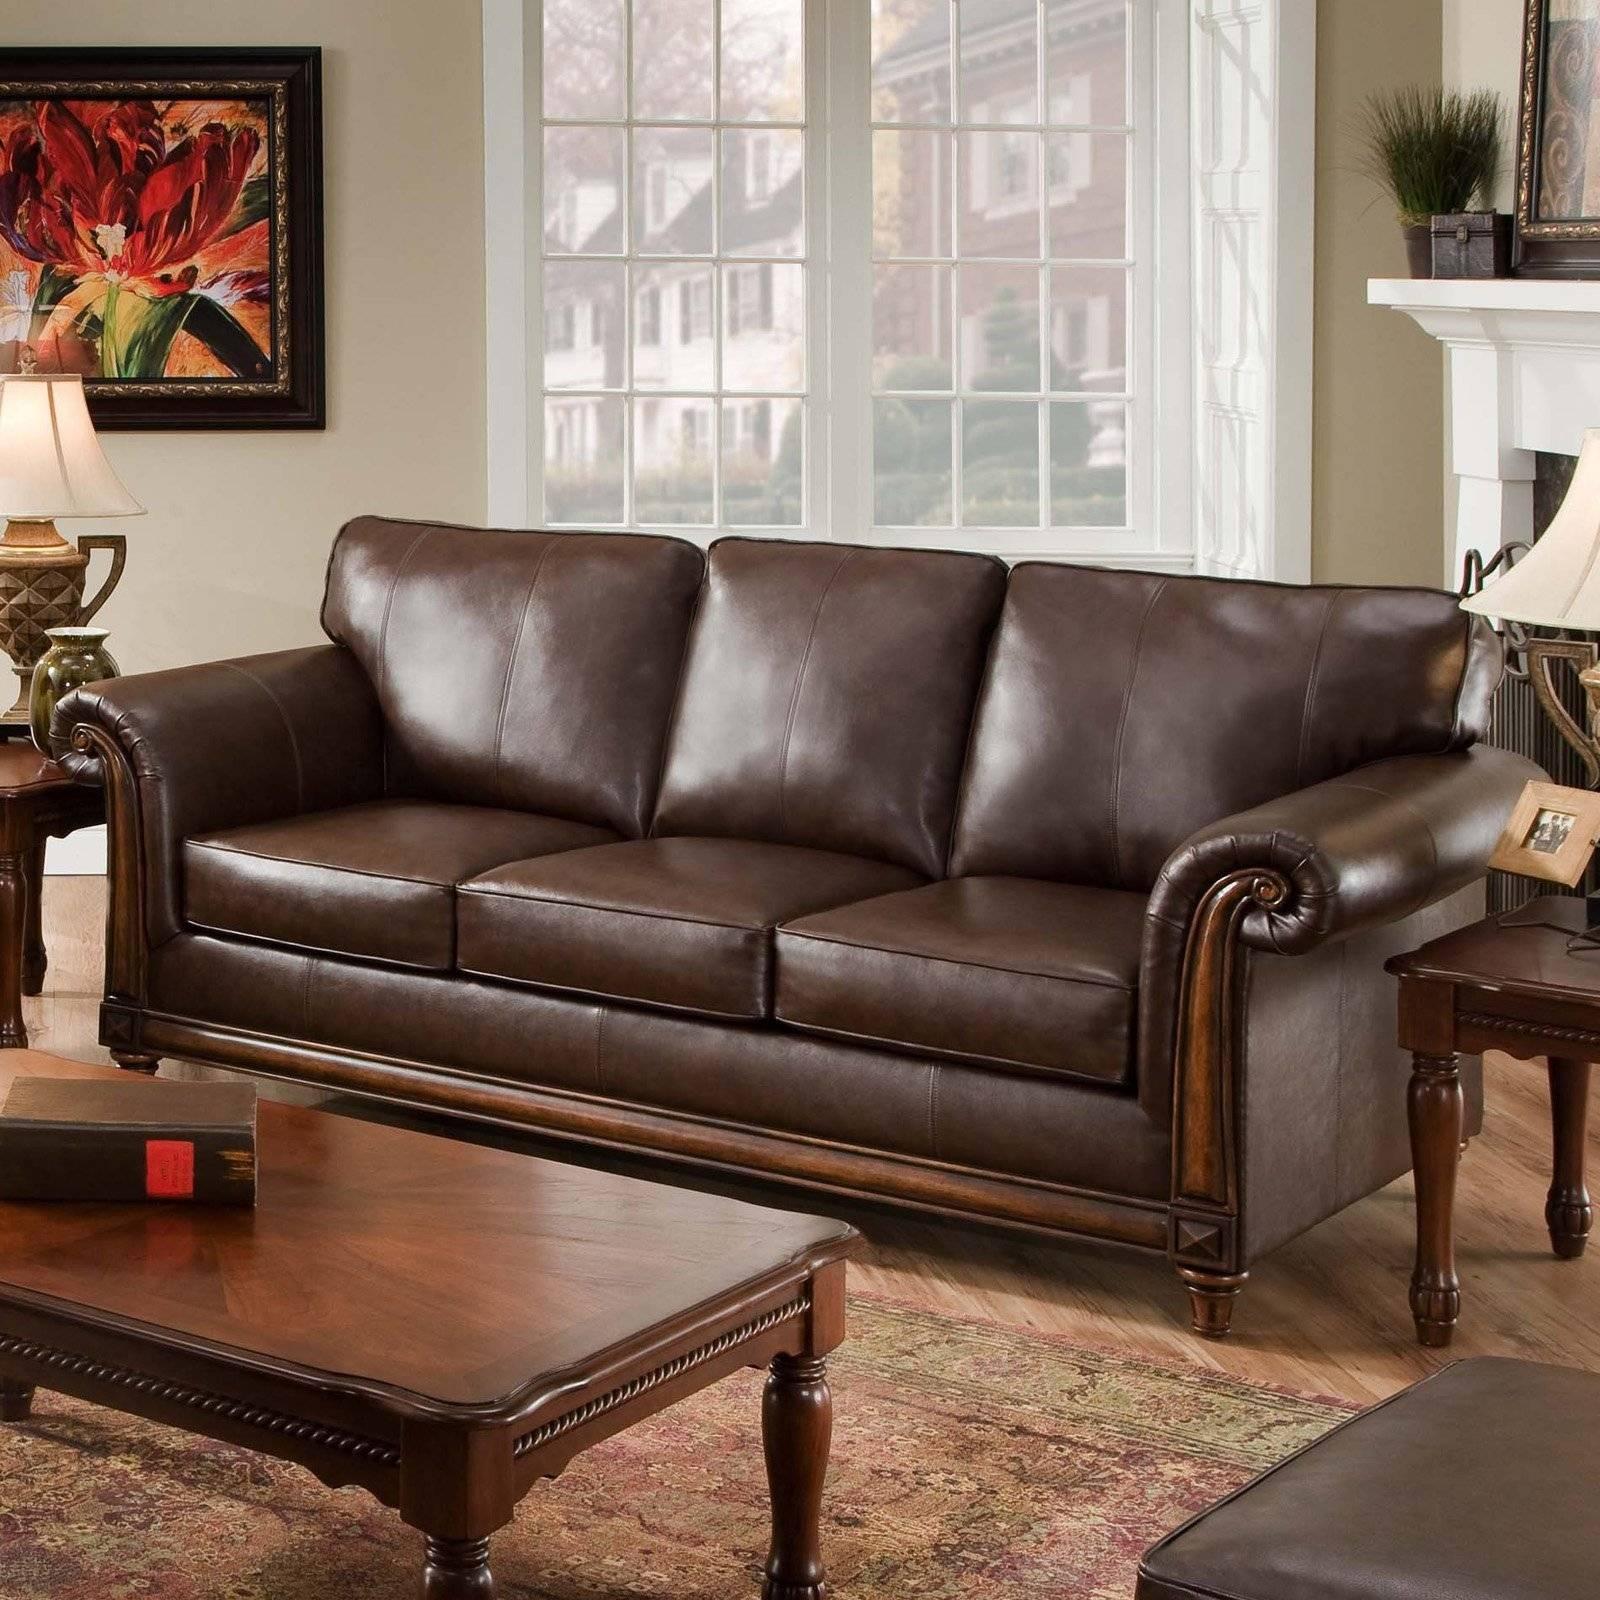 Simmons San Diego Coffee Leather Sofa | Hayneedle inside Simmons Leather Sofas (Image 11 of 15)